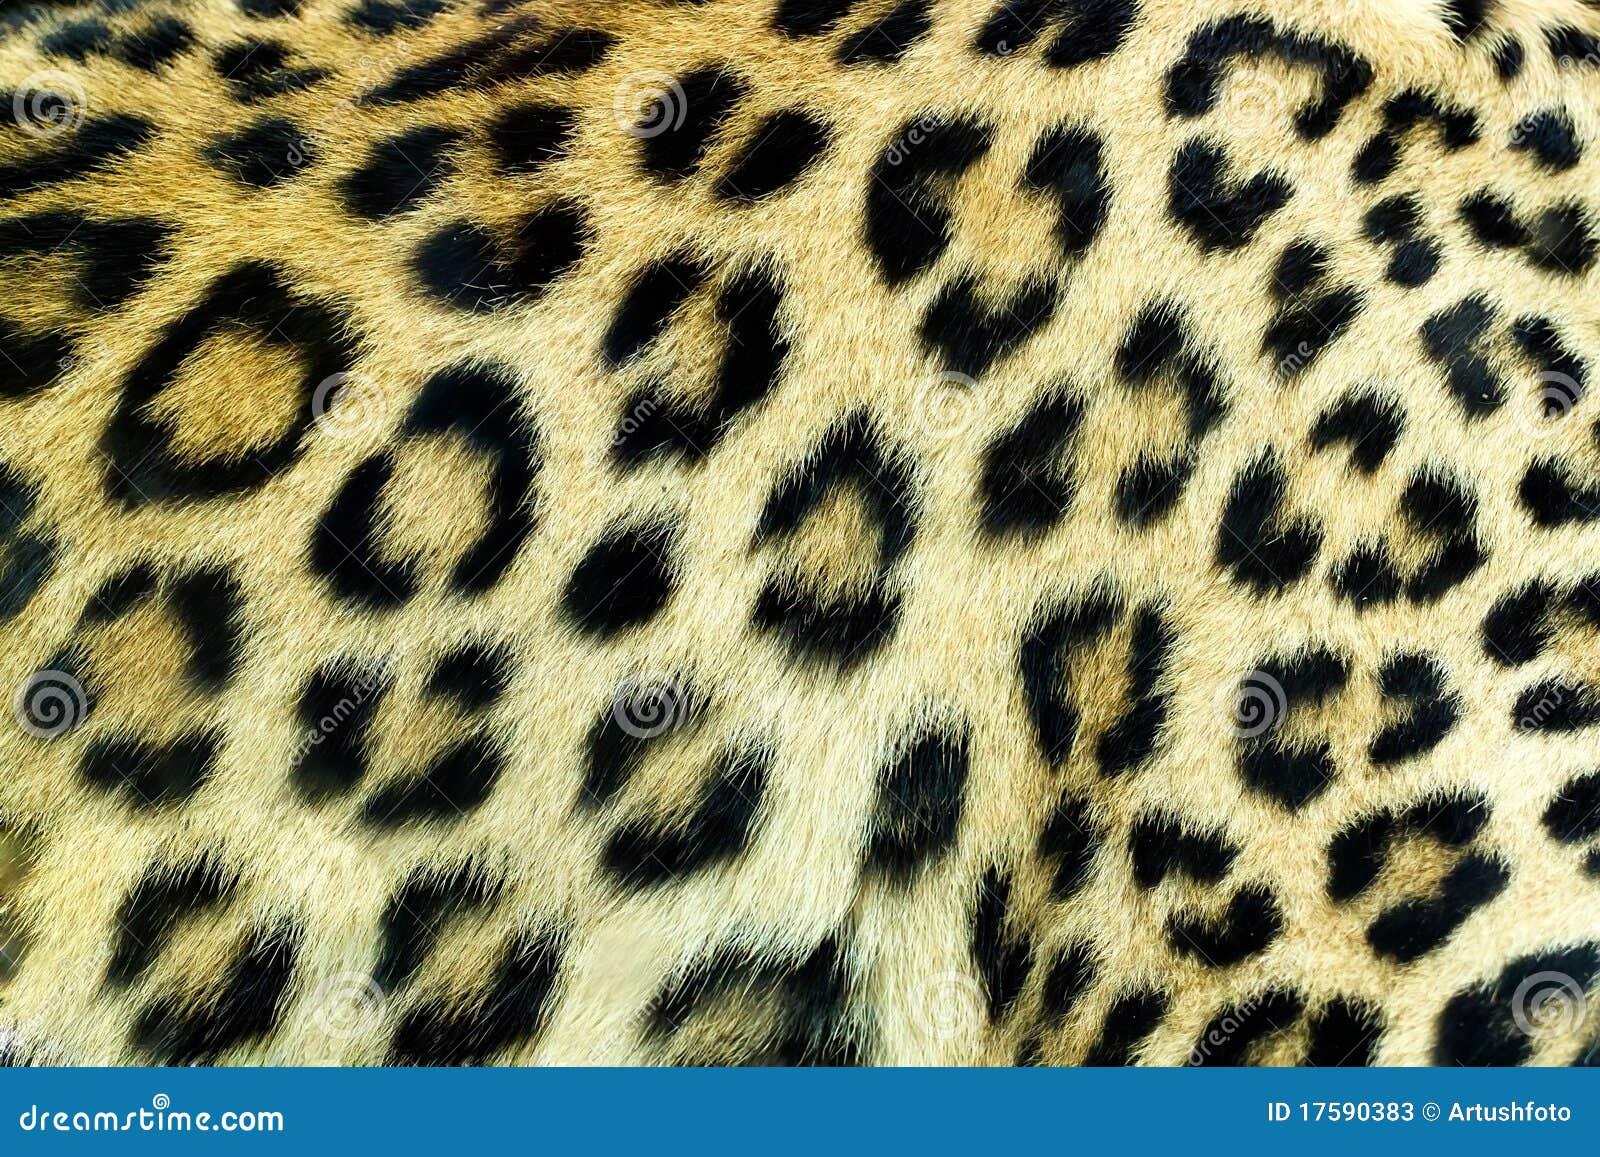 Snow Leopard Skin Www Imgkid Com The Image Kid Has It